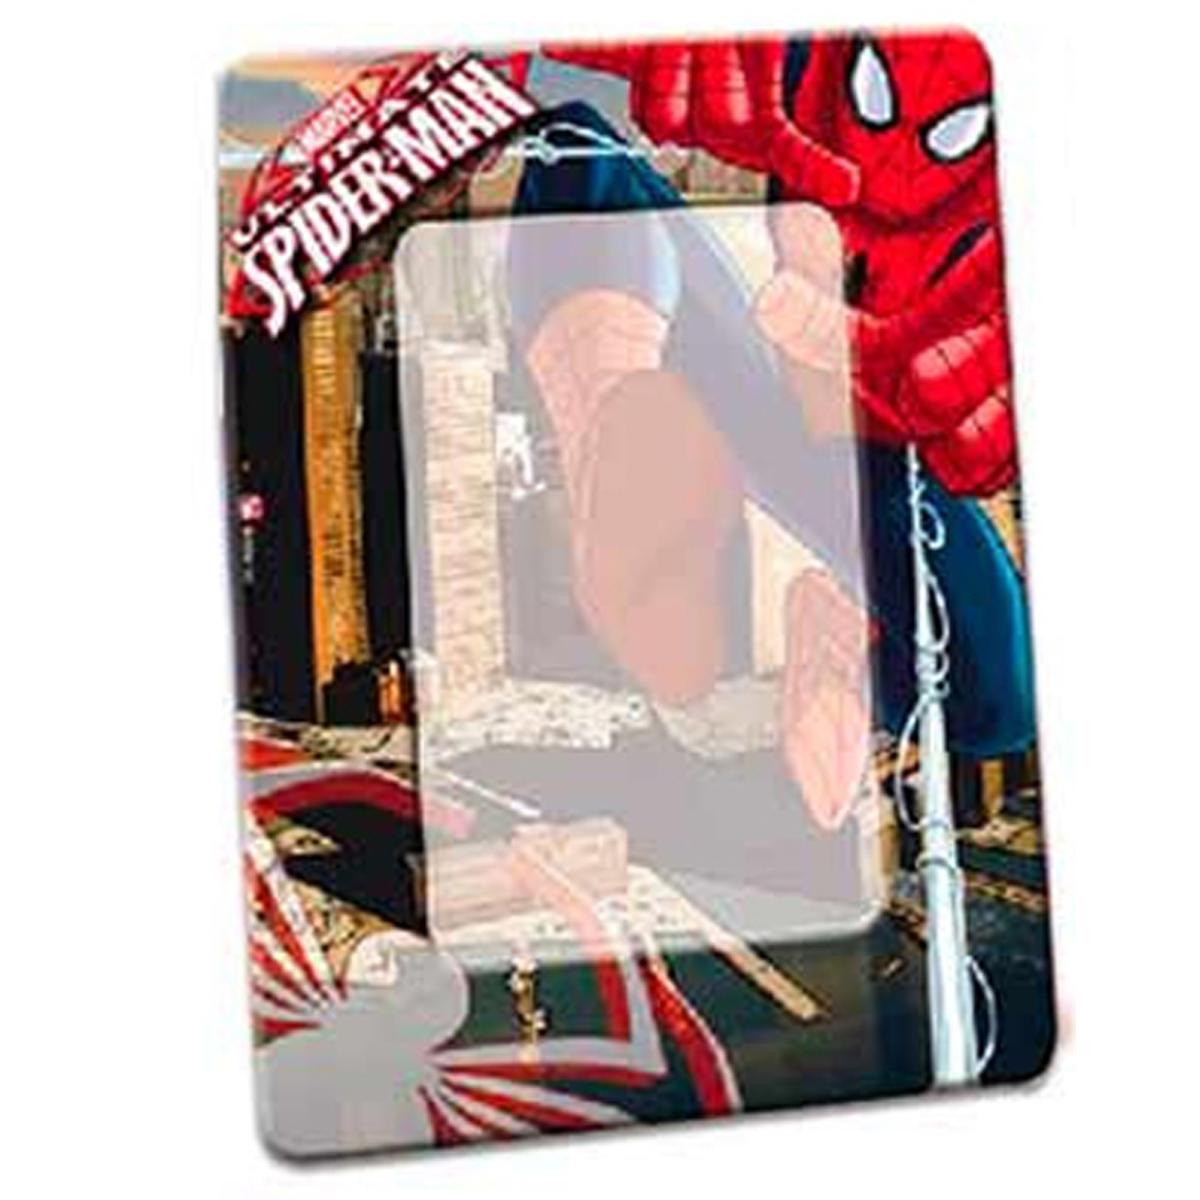 Cadre Photo métal \'Spiderman\' - 19x15 cm, photo 13x9 cm - [R3058]